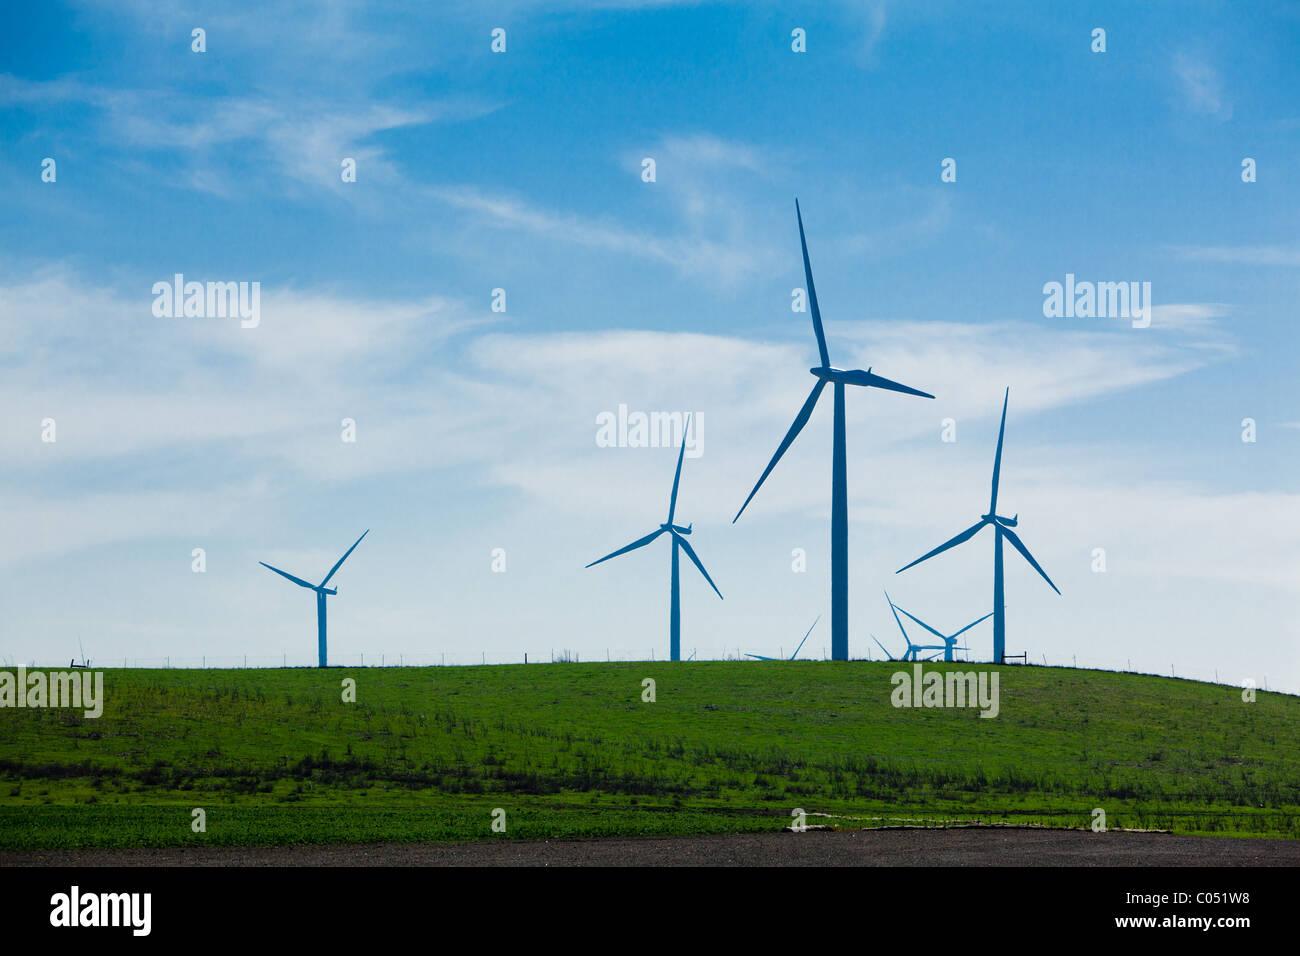 Wind Farm with Blue Sky - Stock Image